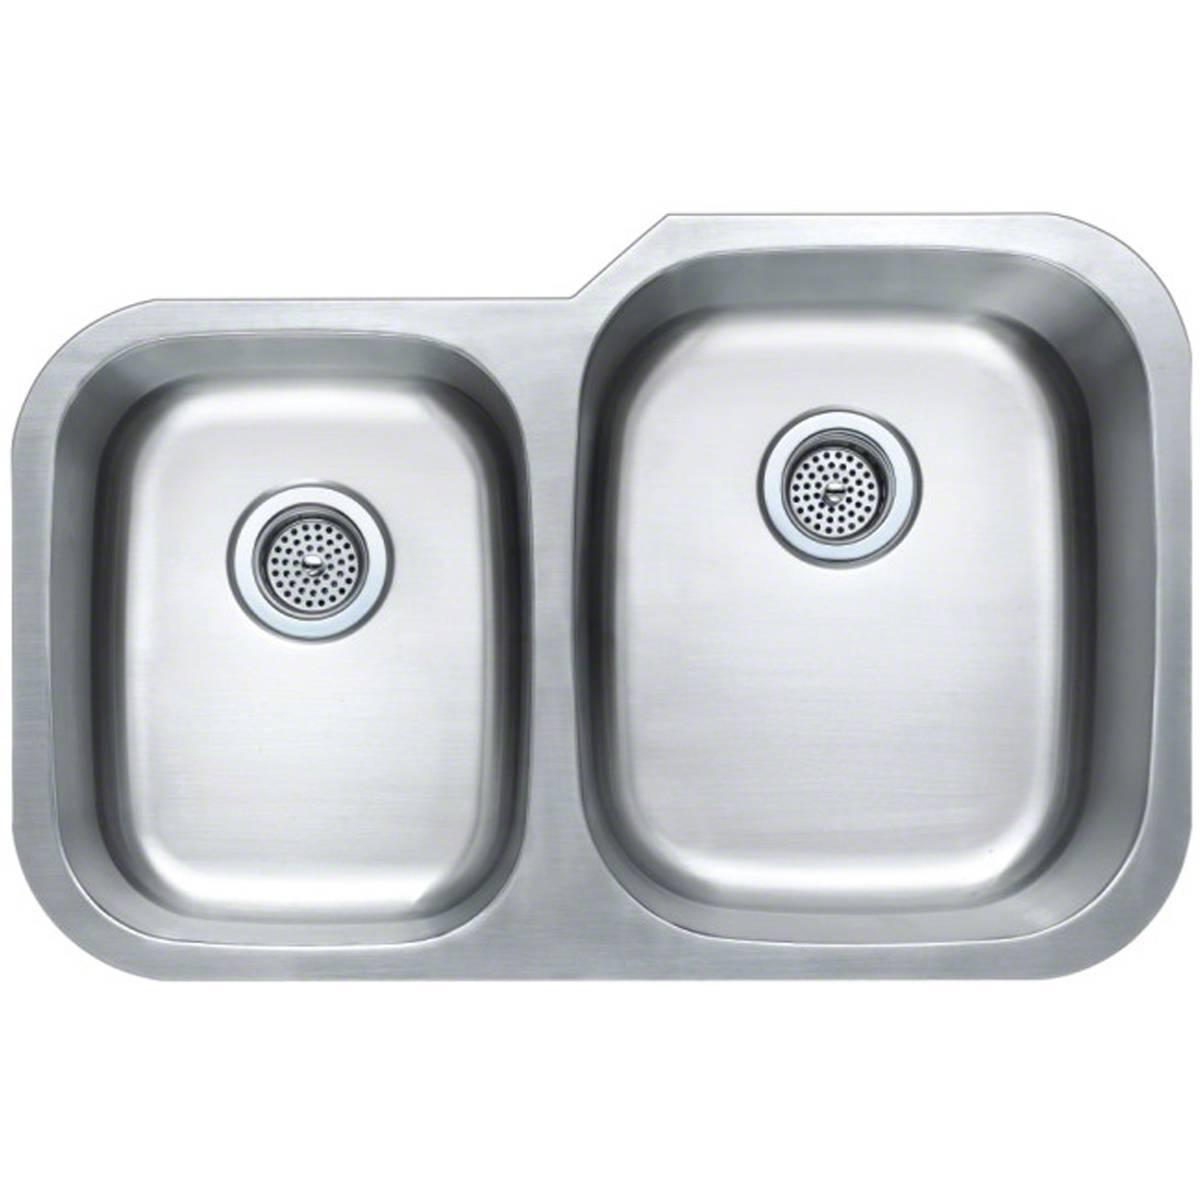 Sinks -ss-18-gau-double-bowl-40-60-3120s-SIN-18-DBLBWL-4060-3120S